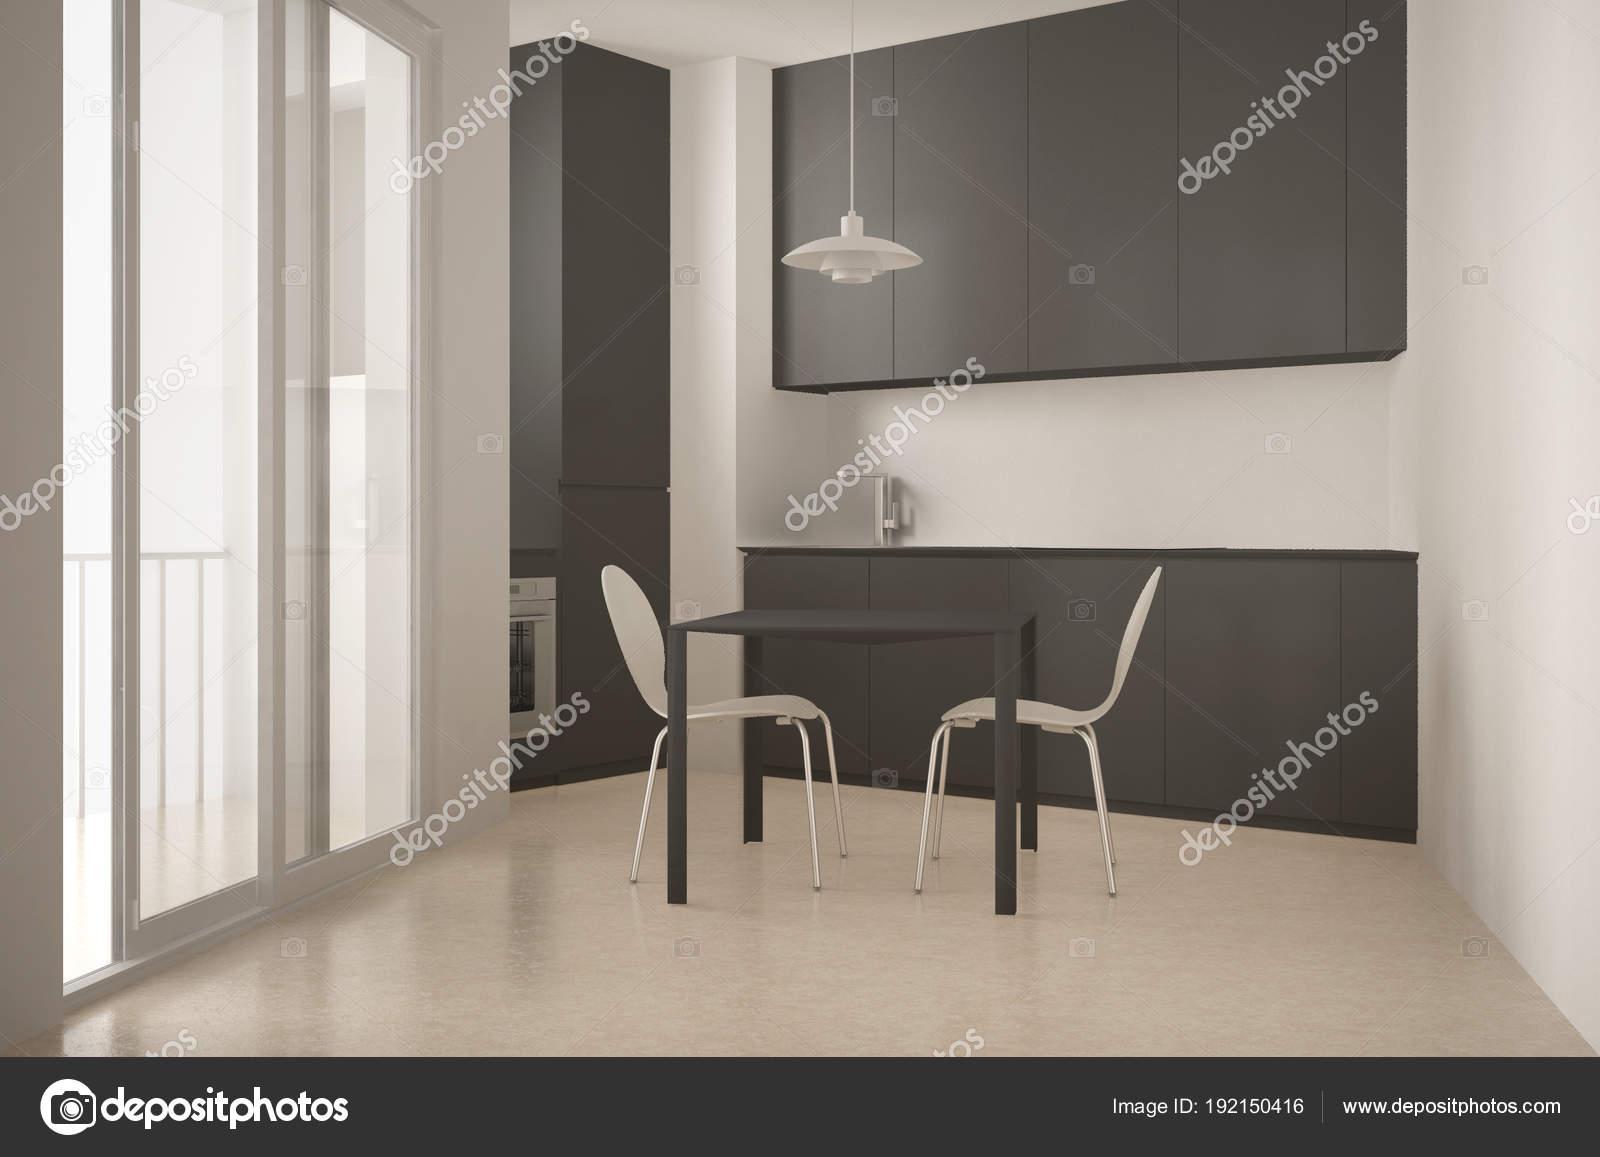 gray kitchen chairs rta cabinets reviews 简约现代厨房 配有椅子 白色和灰色建筑室内设计的大窗户和餐桌 图库 白色和灰色建筑室内设计的大